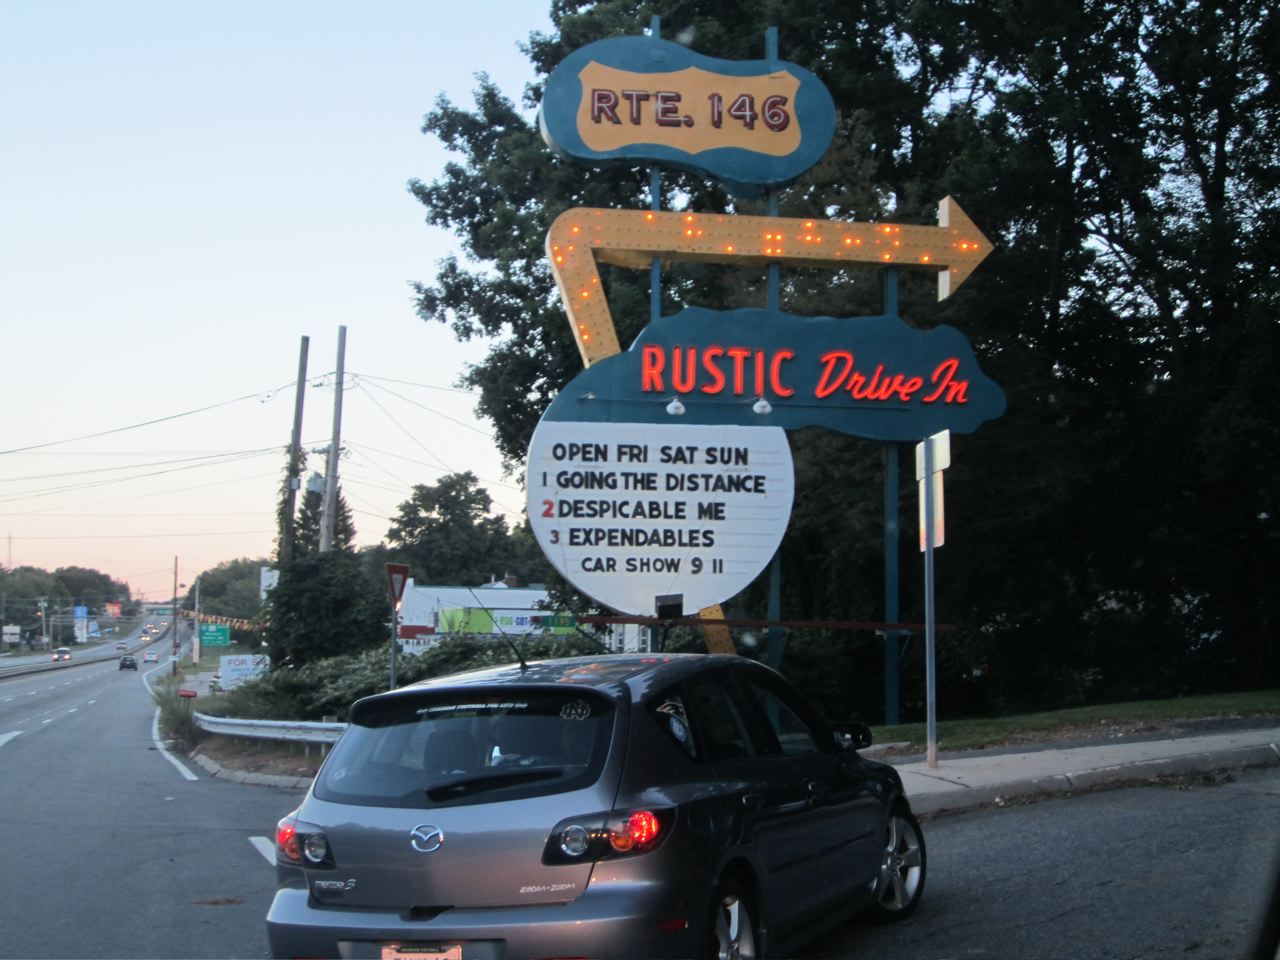 The Rustic Drive In Rhode Island